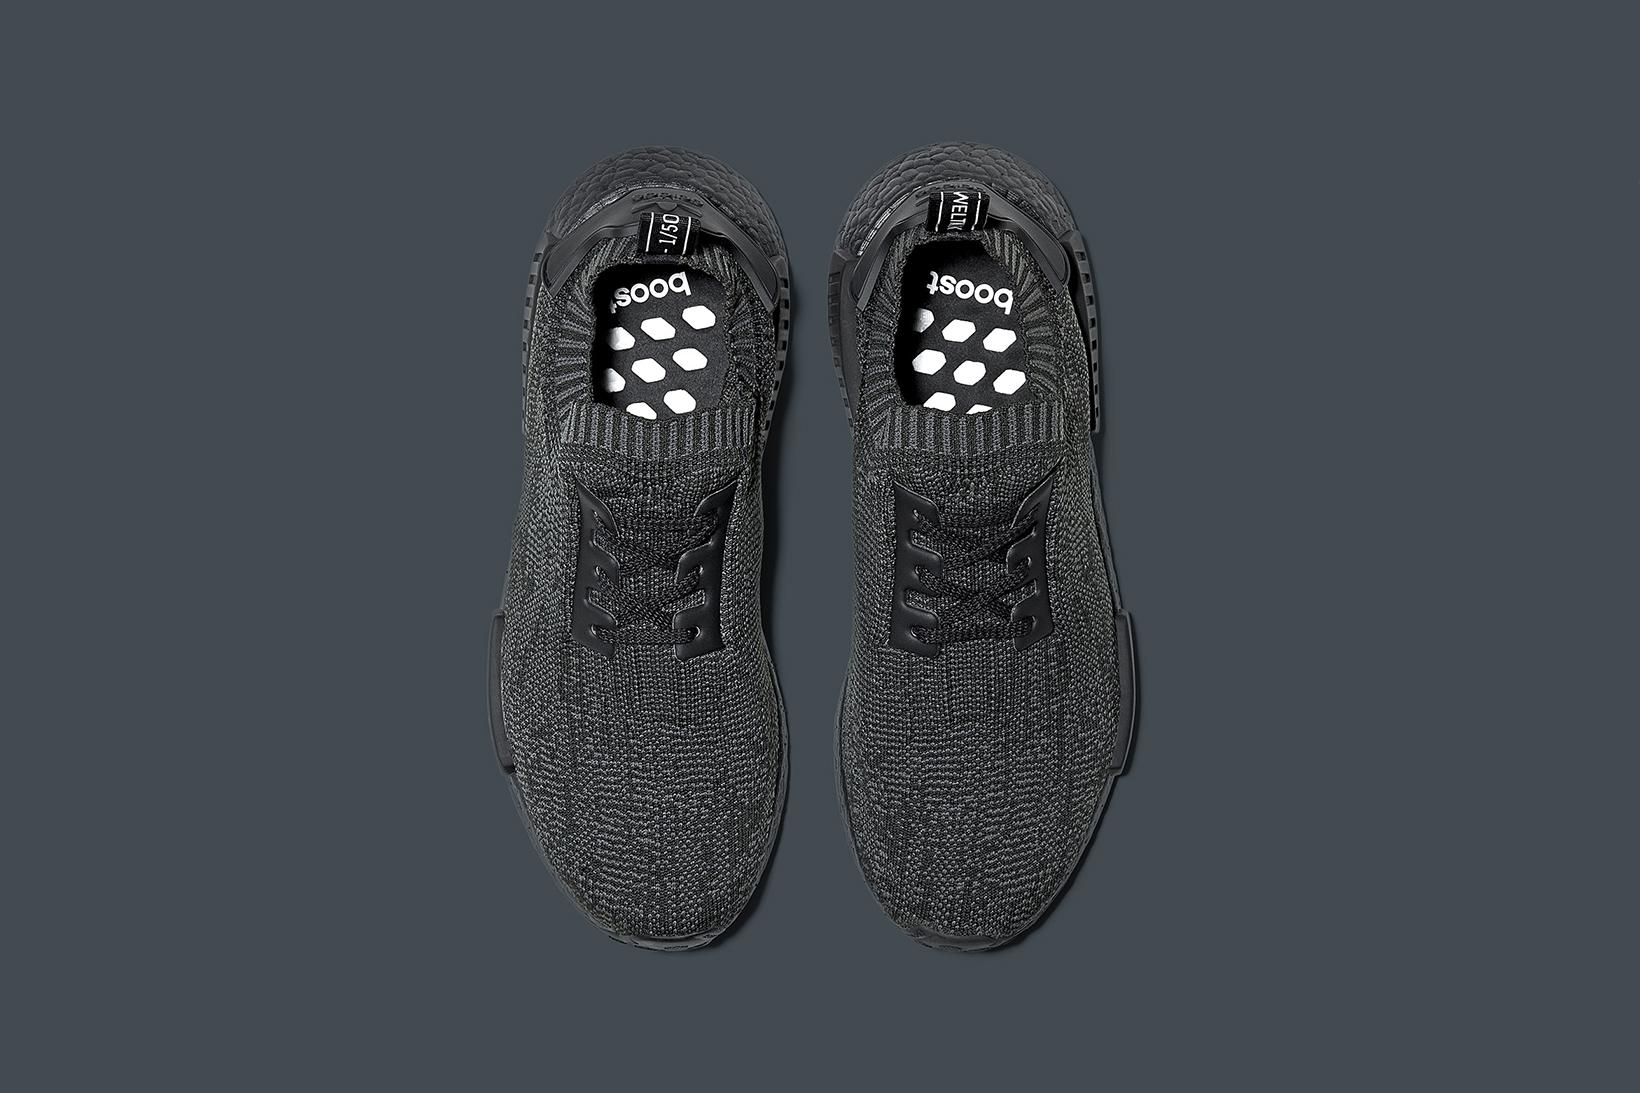 Mens Adidas NMD R1 Black White Gray Size 10 Italia del Vino